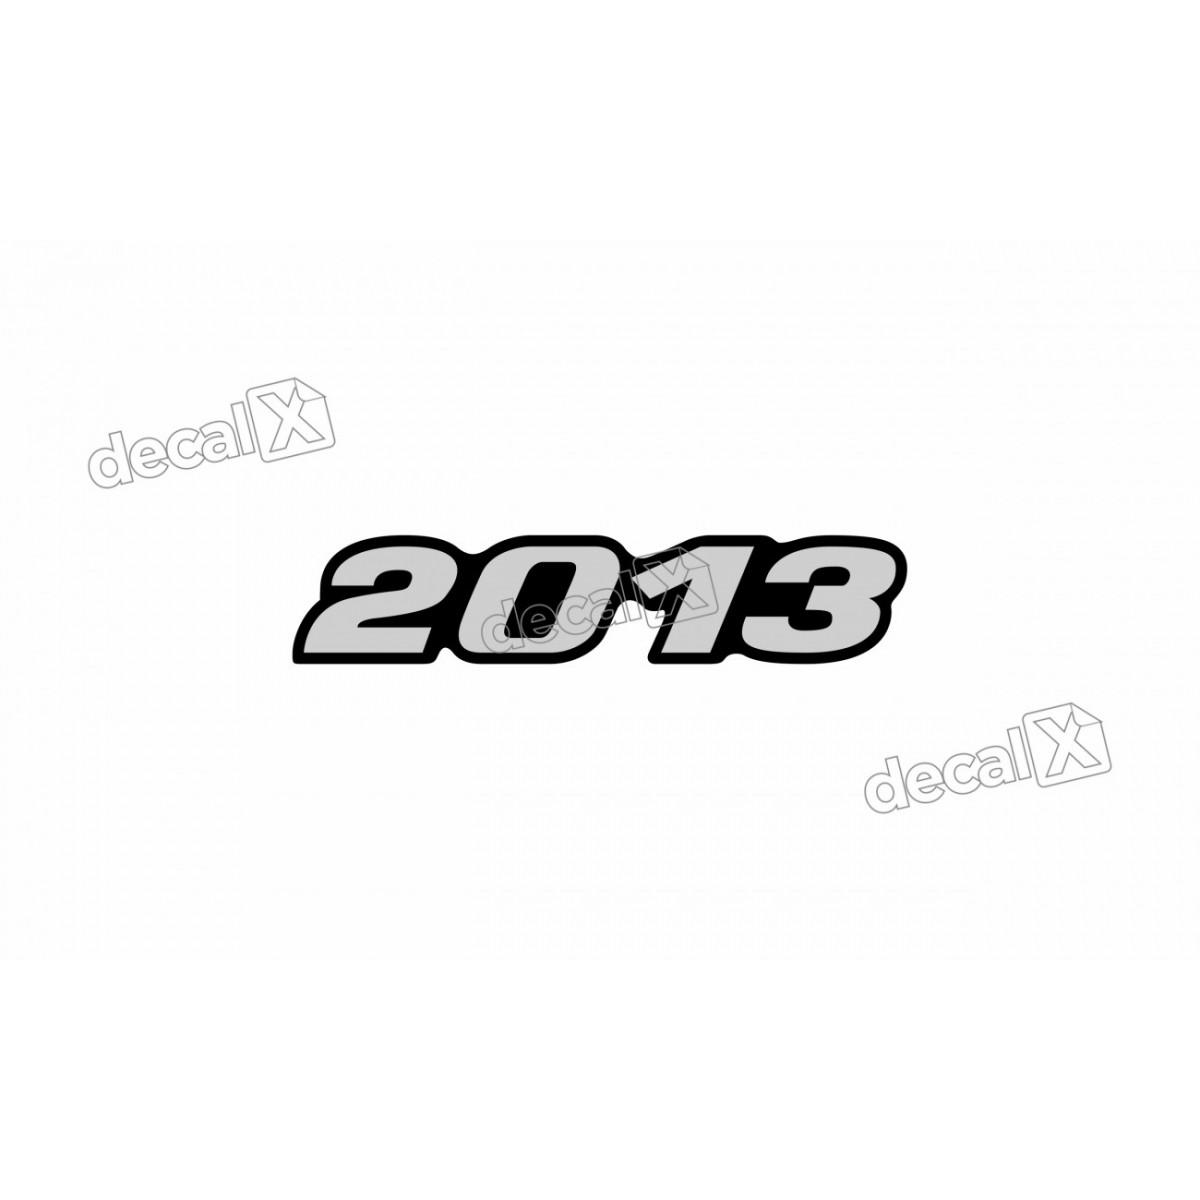 Adesivo Emblema Resinado Mercedes 2013 Cm75 Decalx